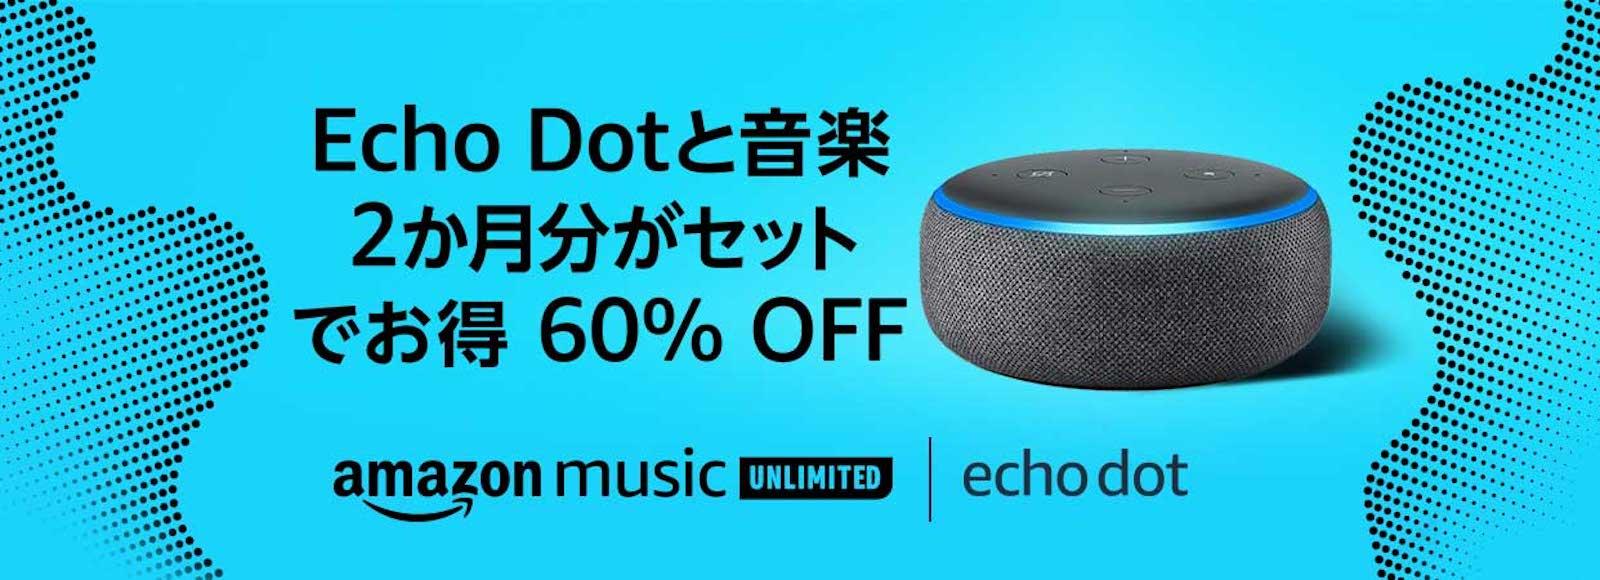 Echodot and amazonmusicumlimited sale